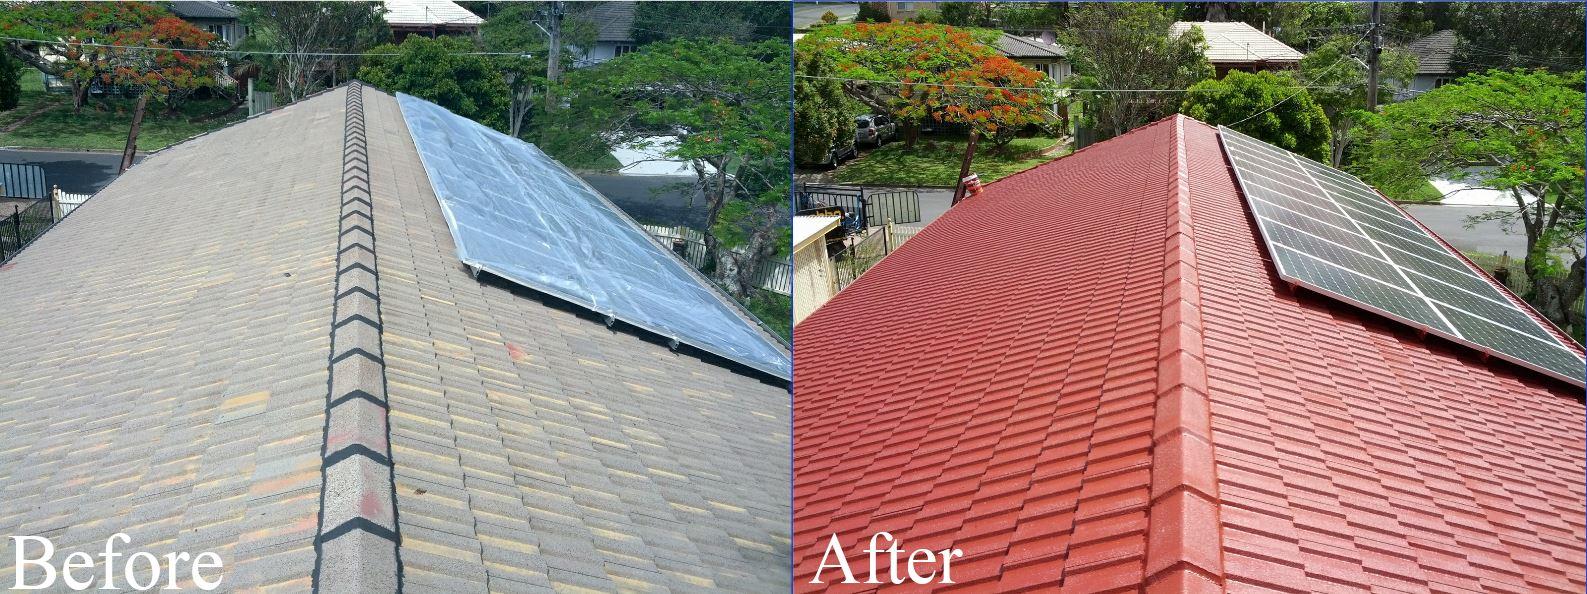 Concrete Tile Roof Restorations Brisbane Roof Restorations